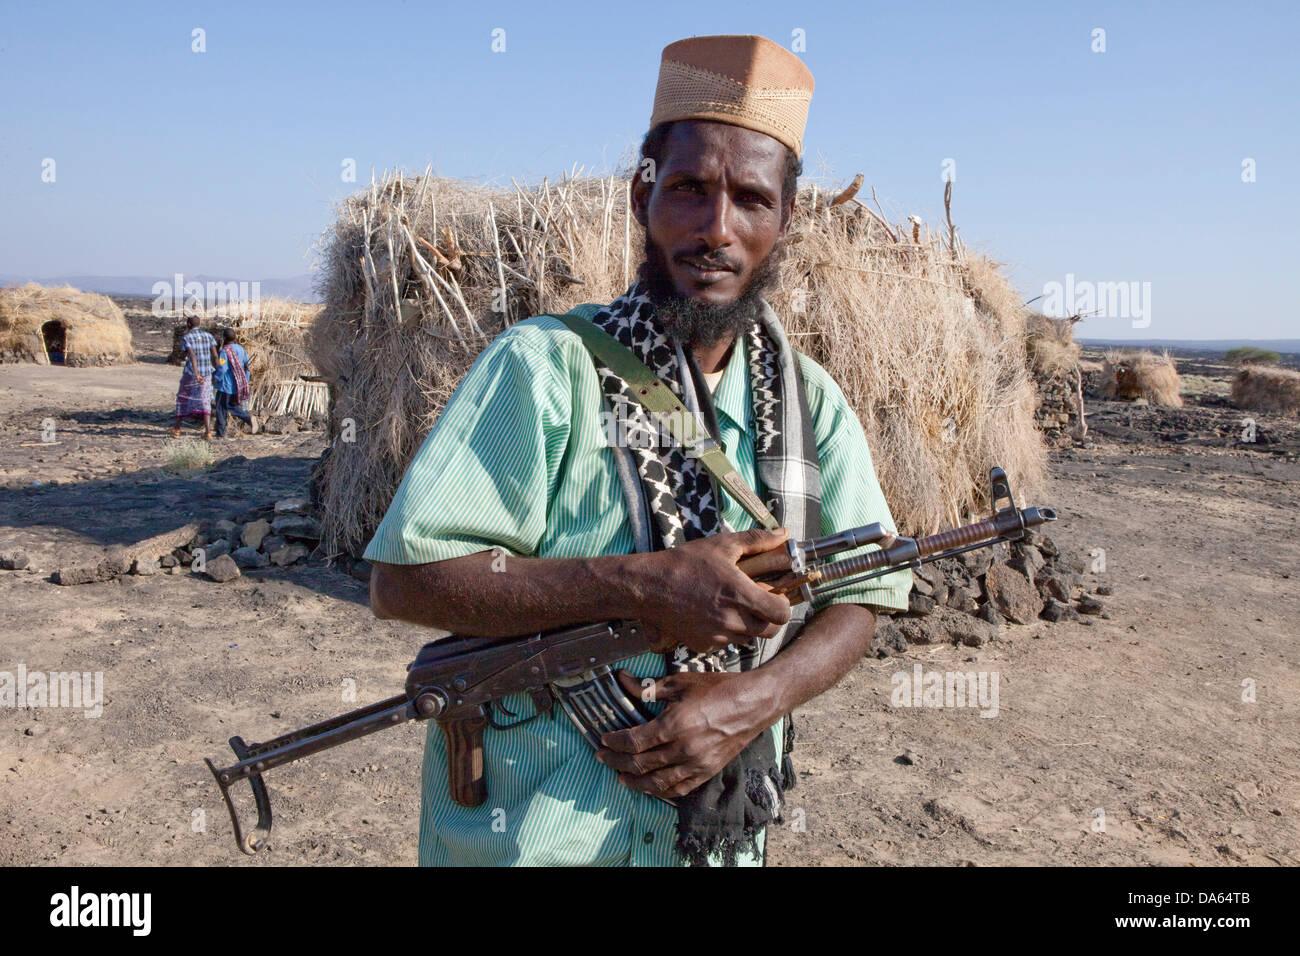 Volcano, Ertale, volcanical, Africa, hut, guard, man, submachine gun - Stock Image